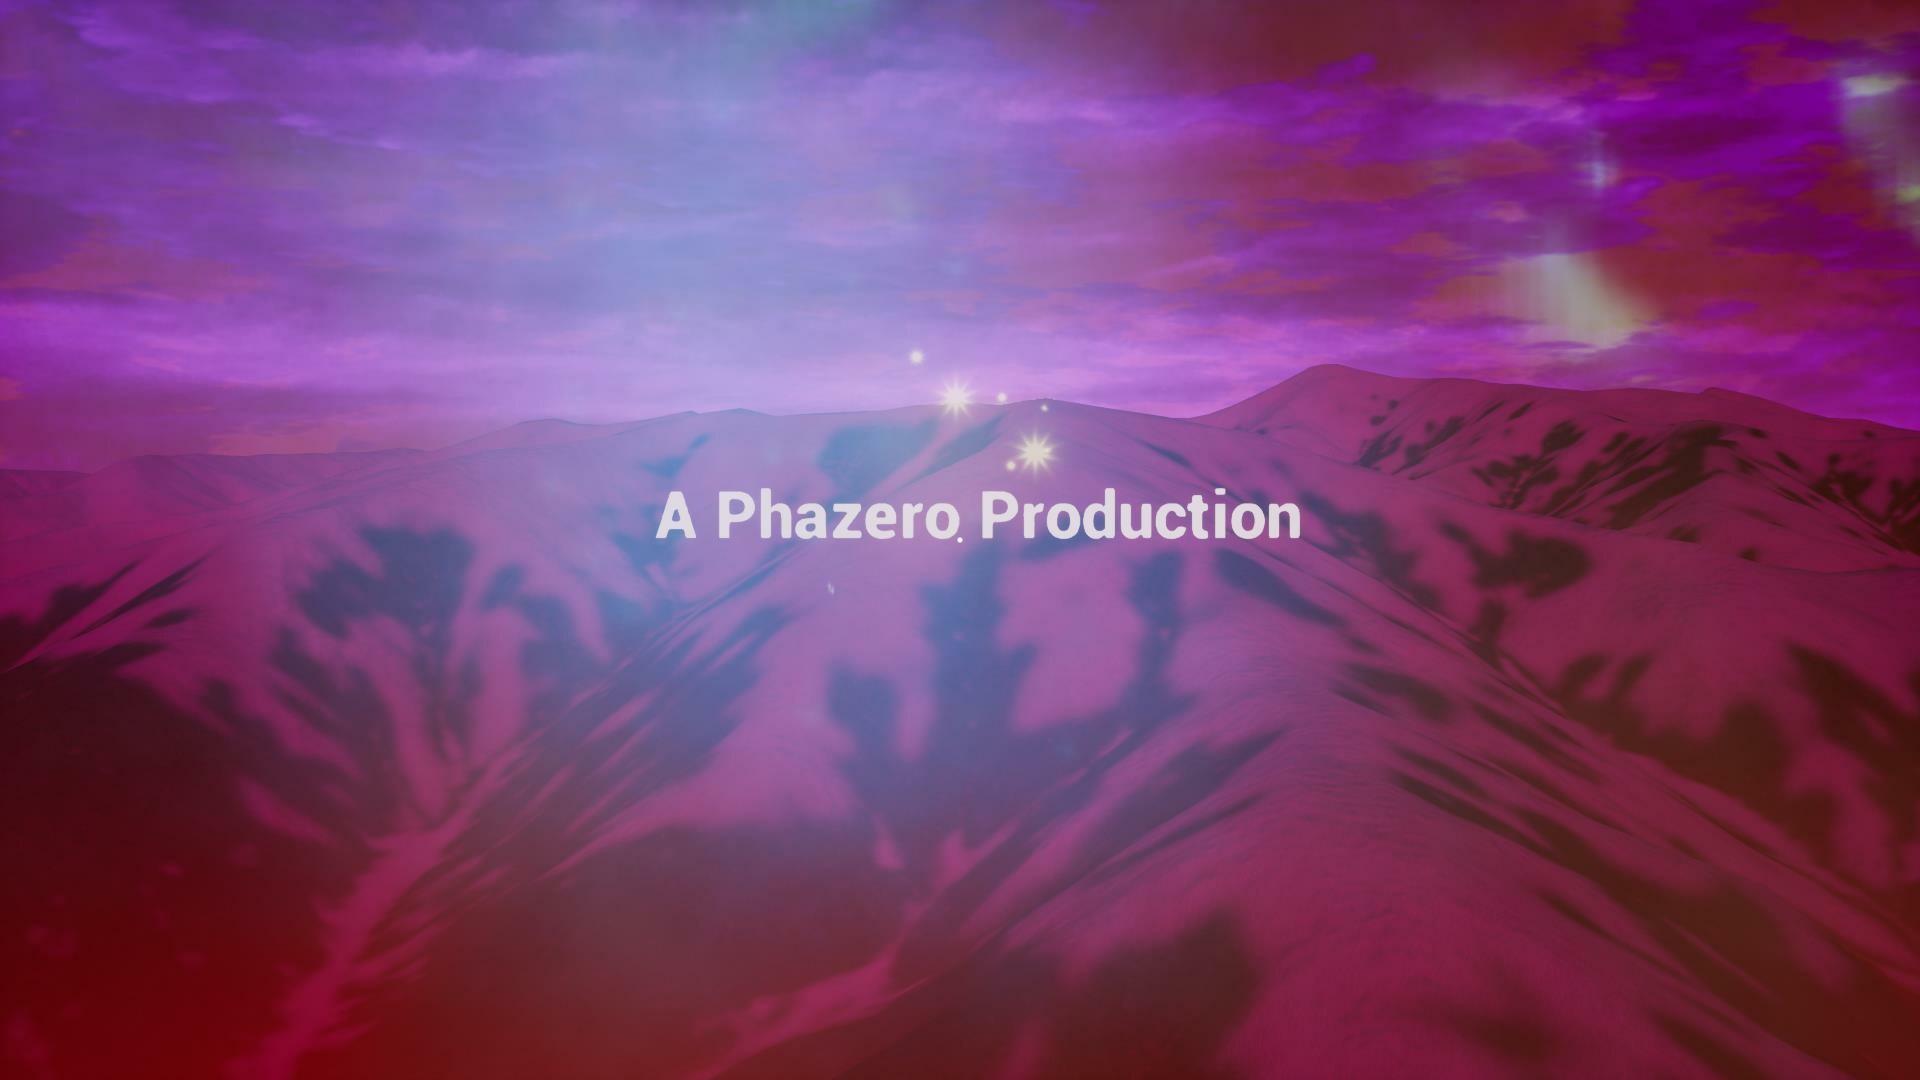 Christina phazero curlee gdthegame 64 bit develop 2019 05 25 22 50 04